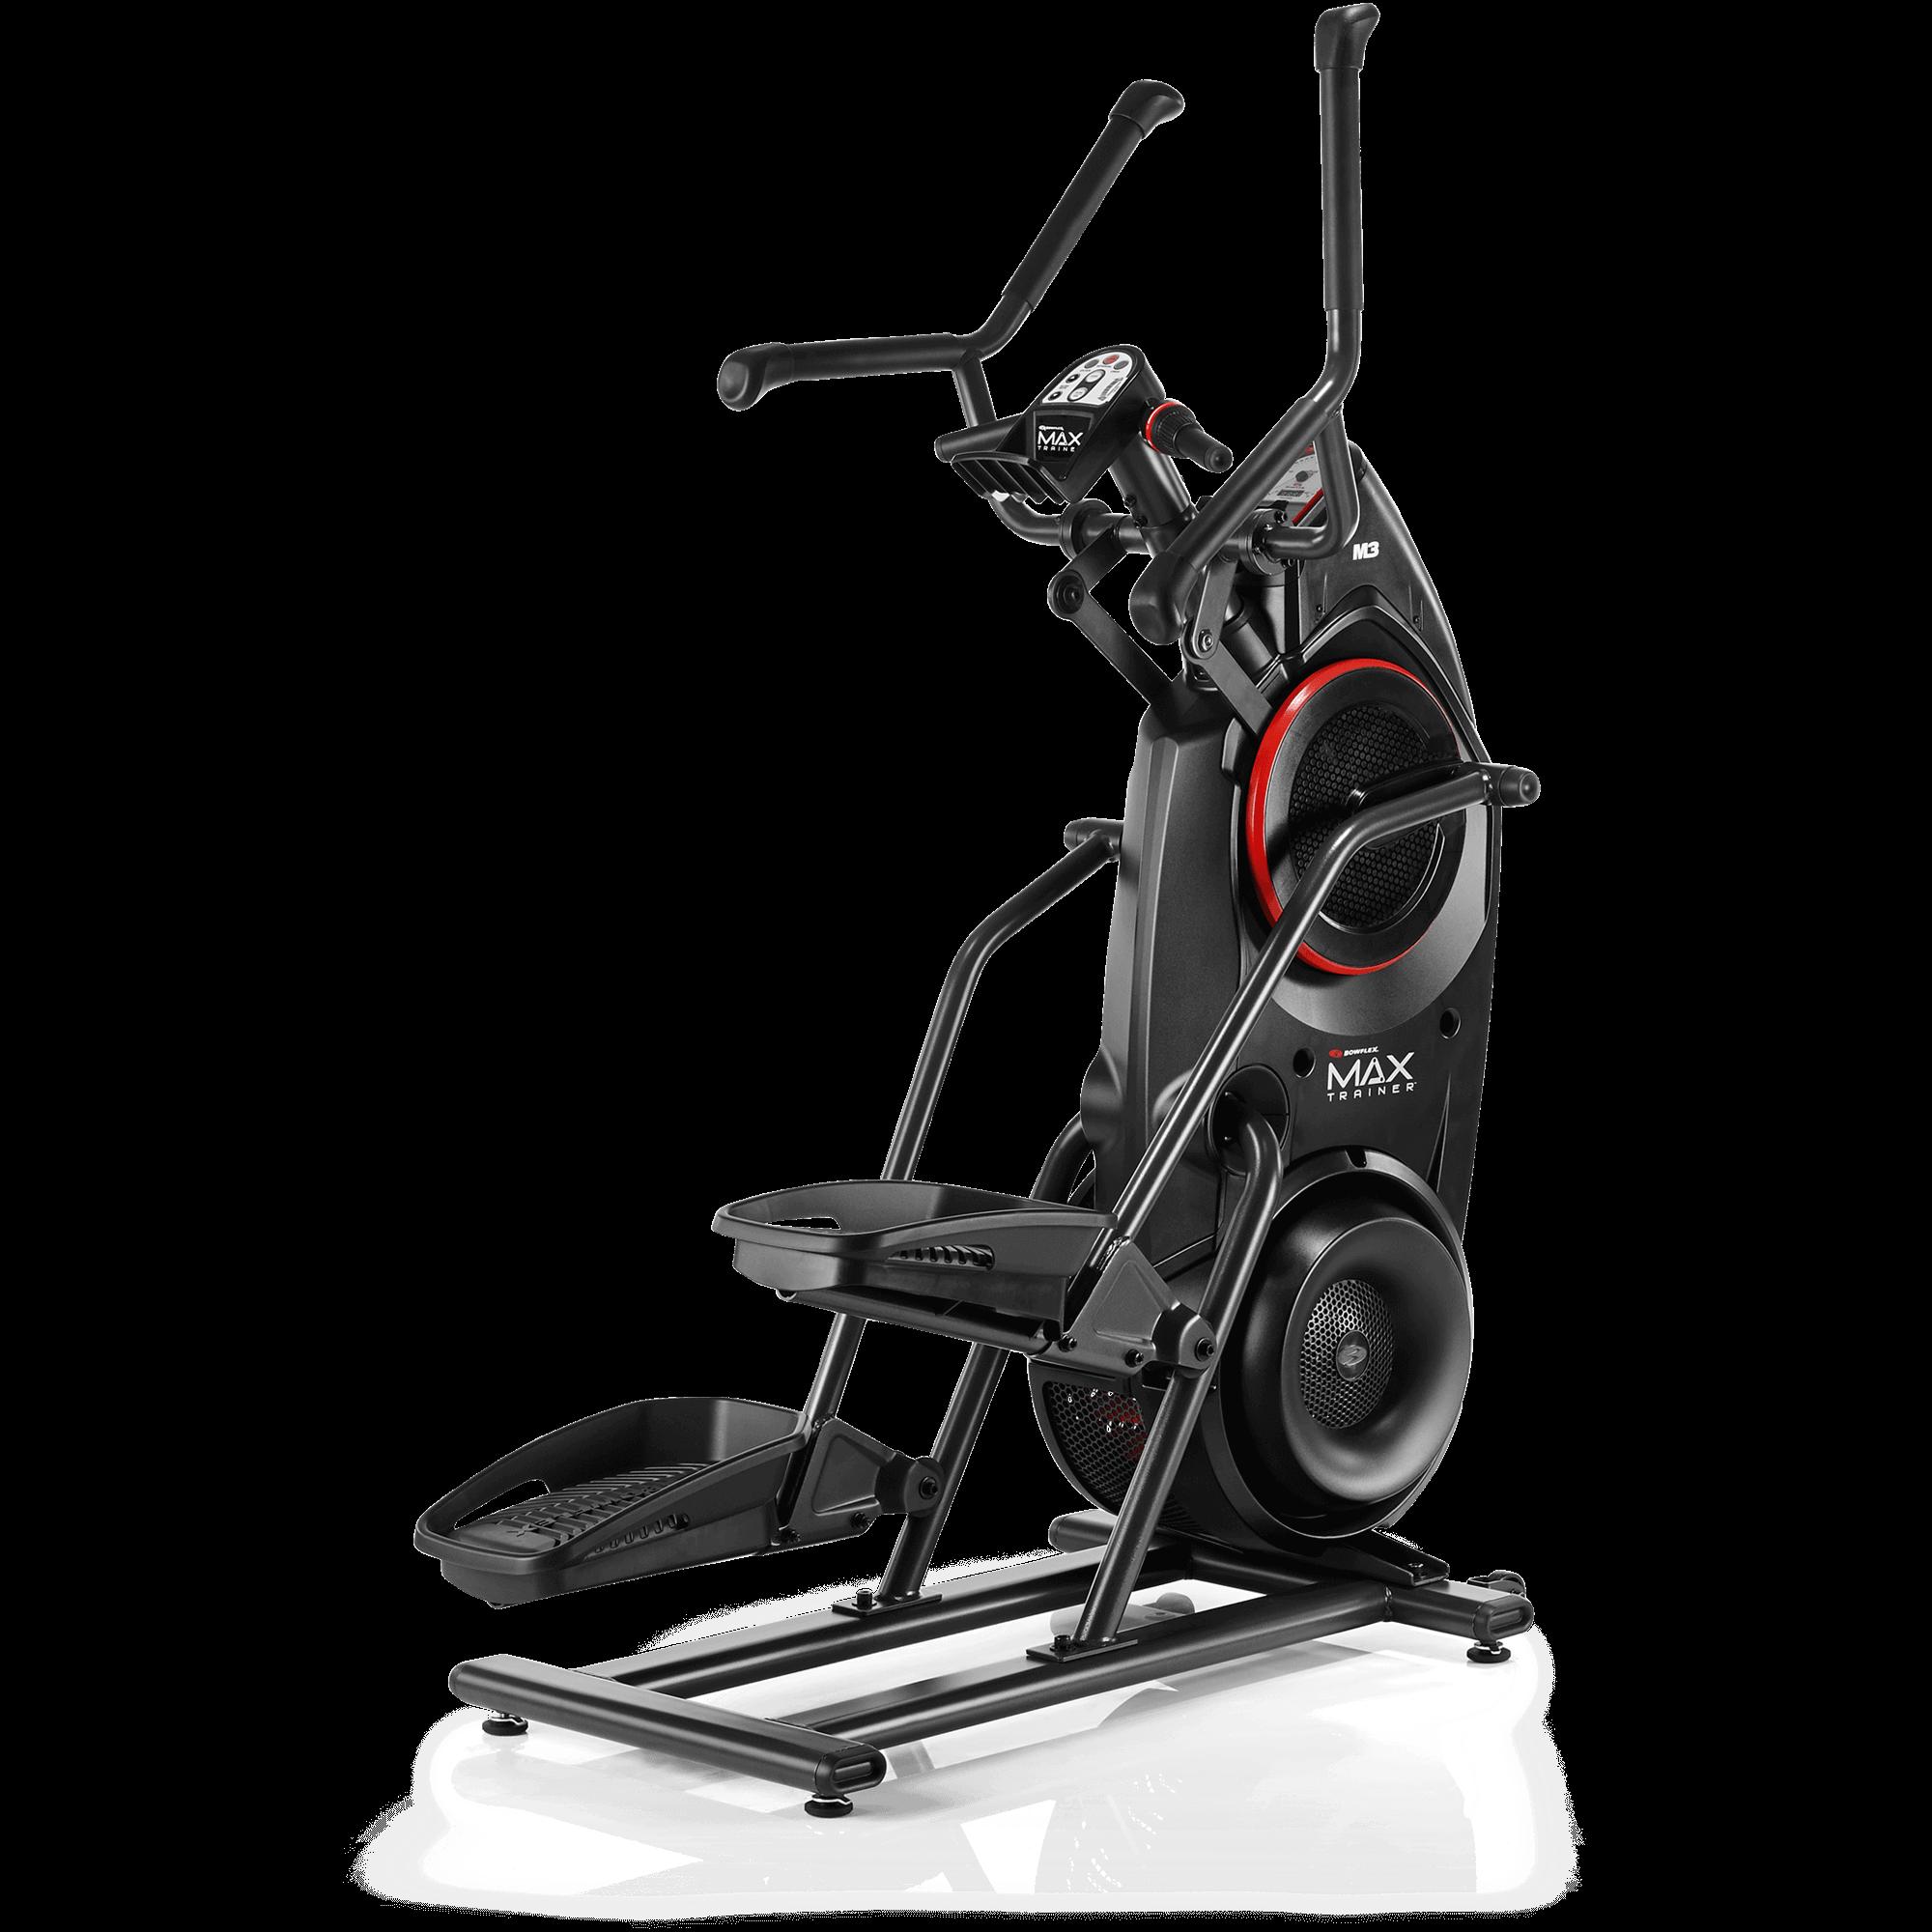 Bowflex Max Trainer M3 | Bowflex